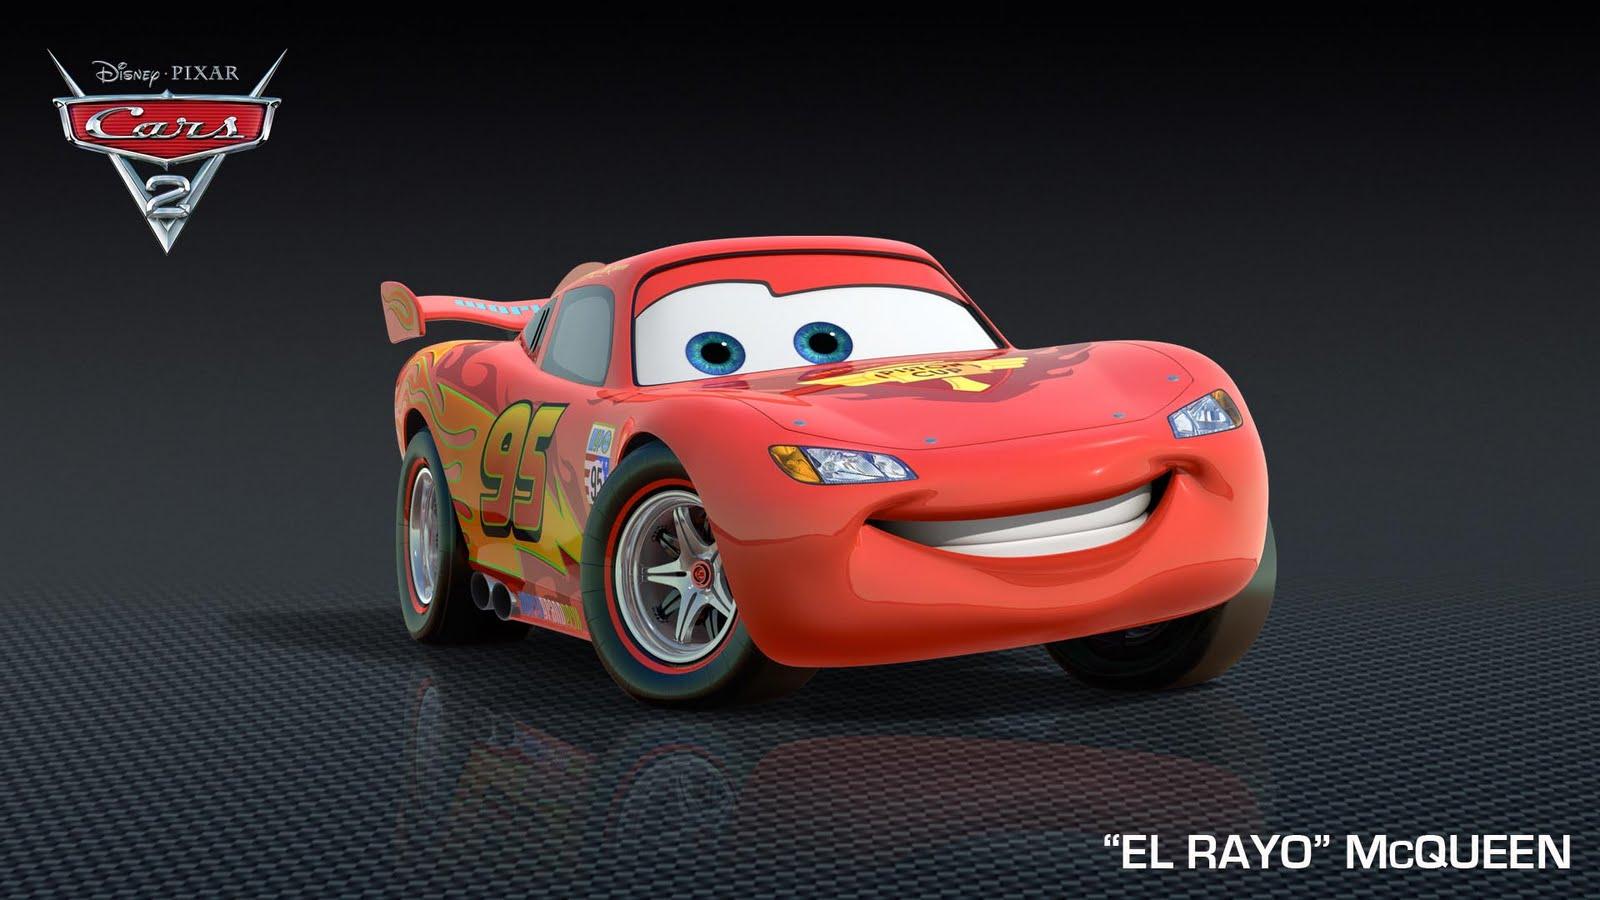 Raoul Caroule Fondo Hd Cars El Rayo Mcqueen 144257 Wallpaper wallpaper